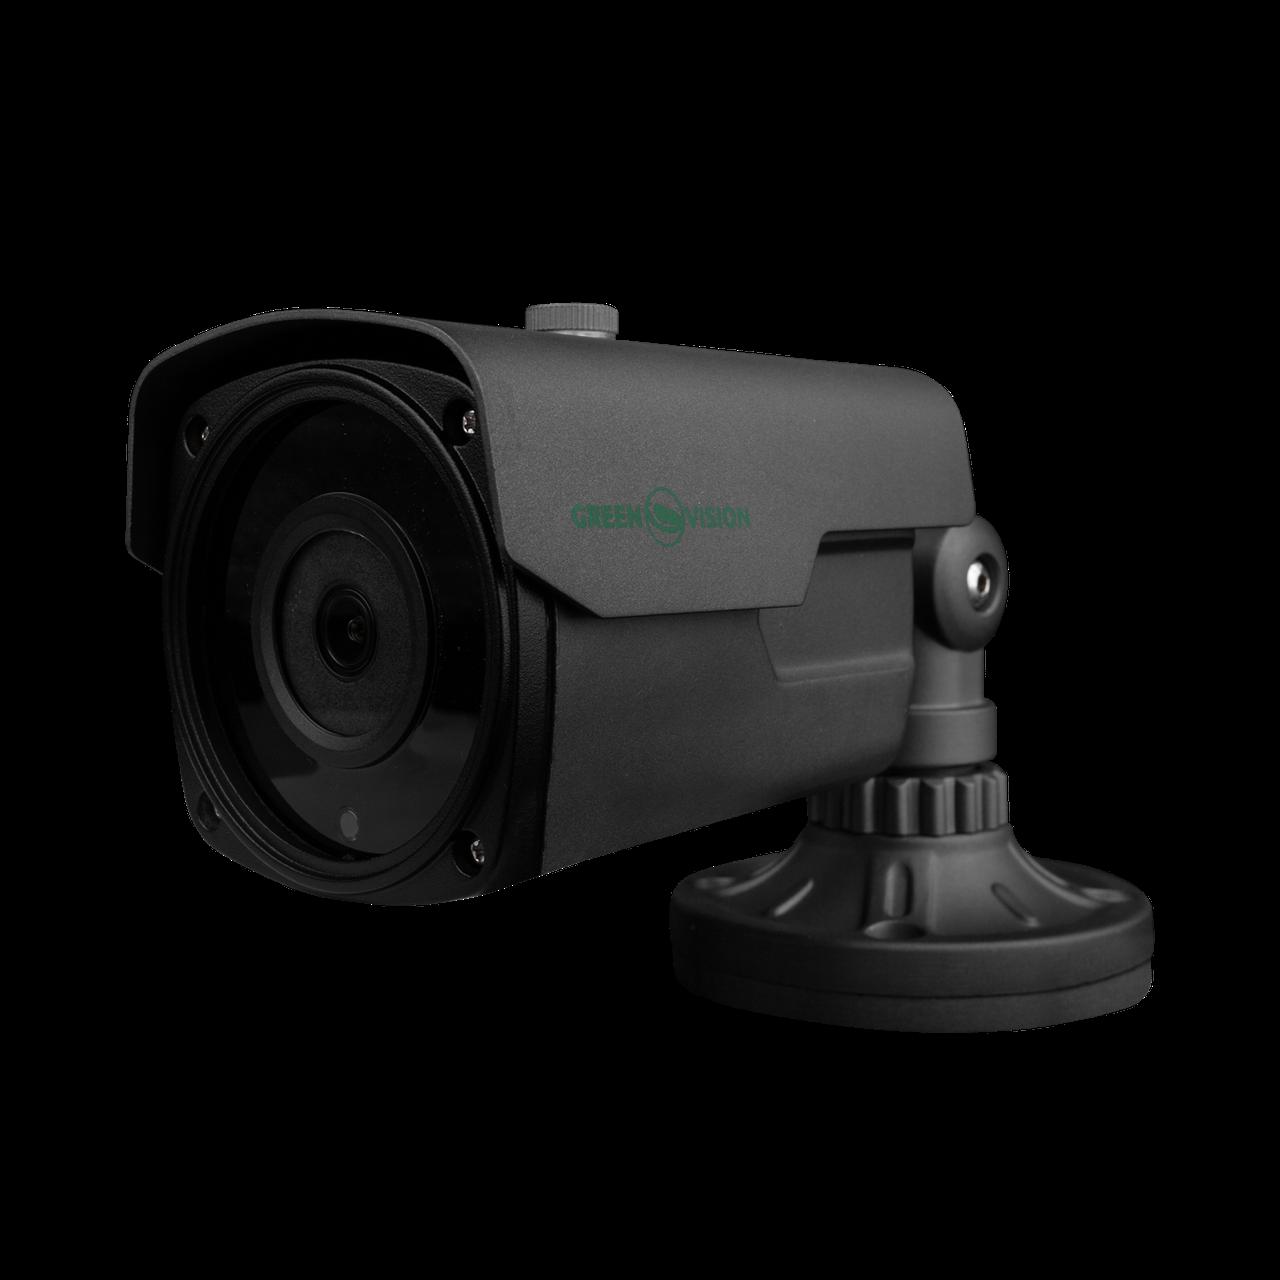 IP камера наружная I GreenVision GV-063-IP-E-COS50-40 Gray